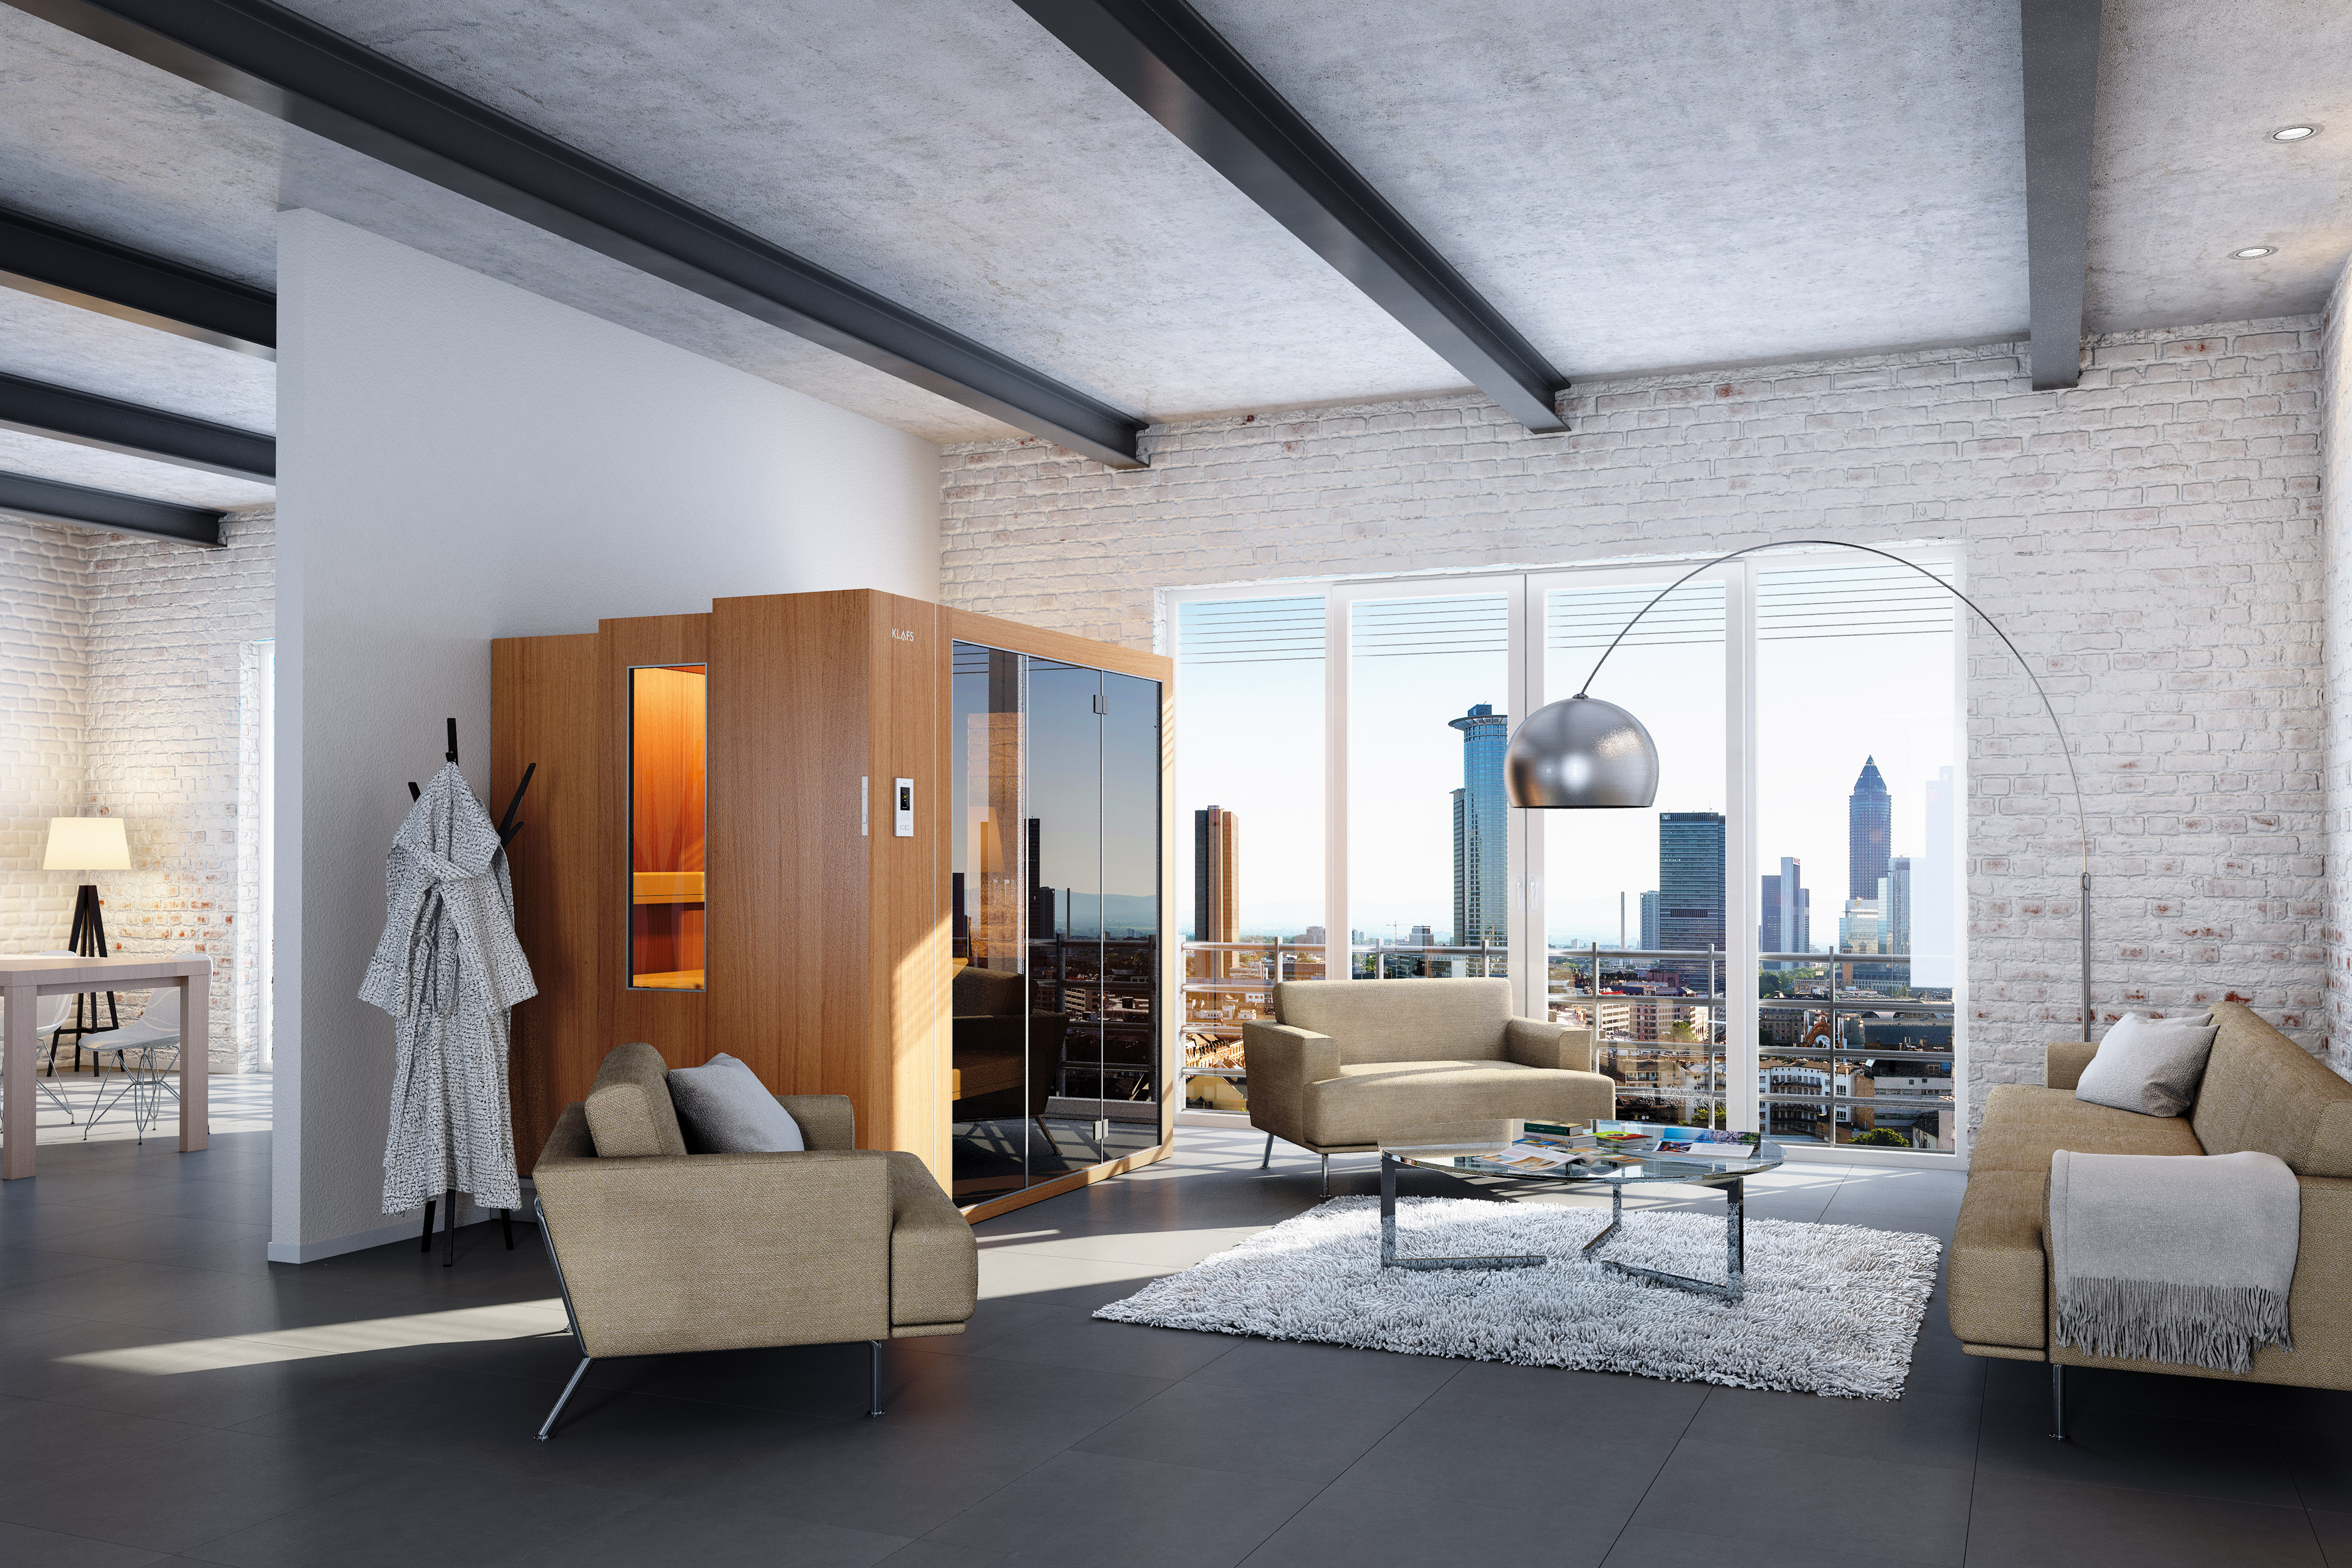 klafs sauna s1 by klafs gmbh co kg archello. Black Bedroom Furniture Sets. Home Design Ideas